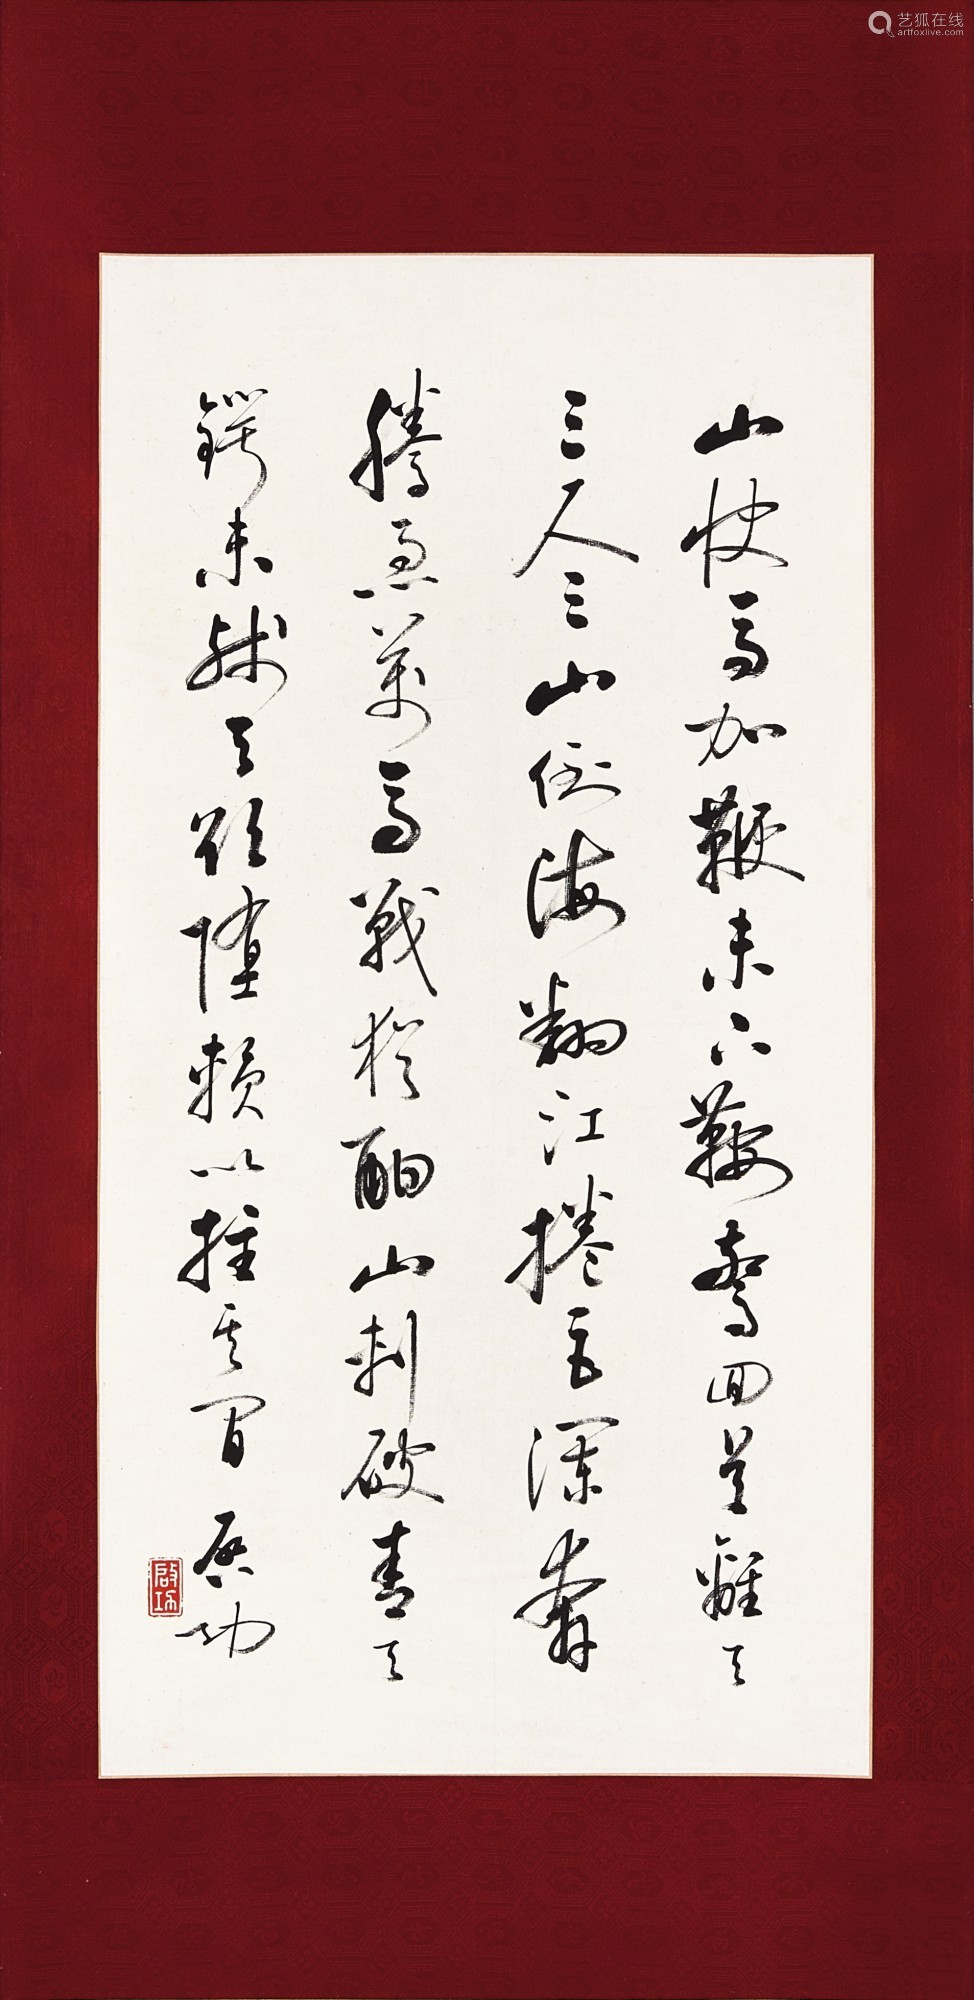 Qi Gong 啟功 | Mao Zedong's Poem in Caoshu 草書毛澤東詞